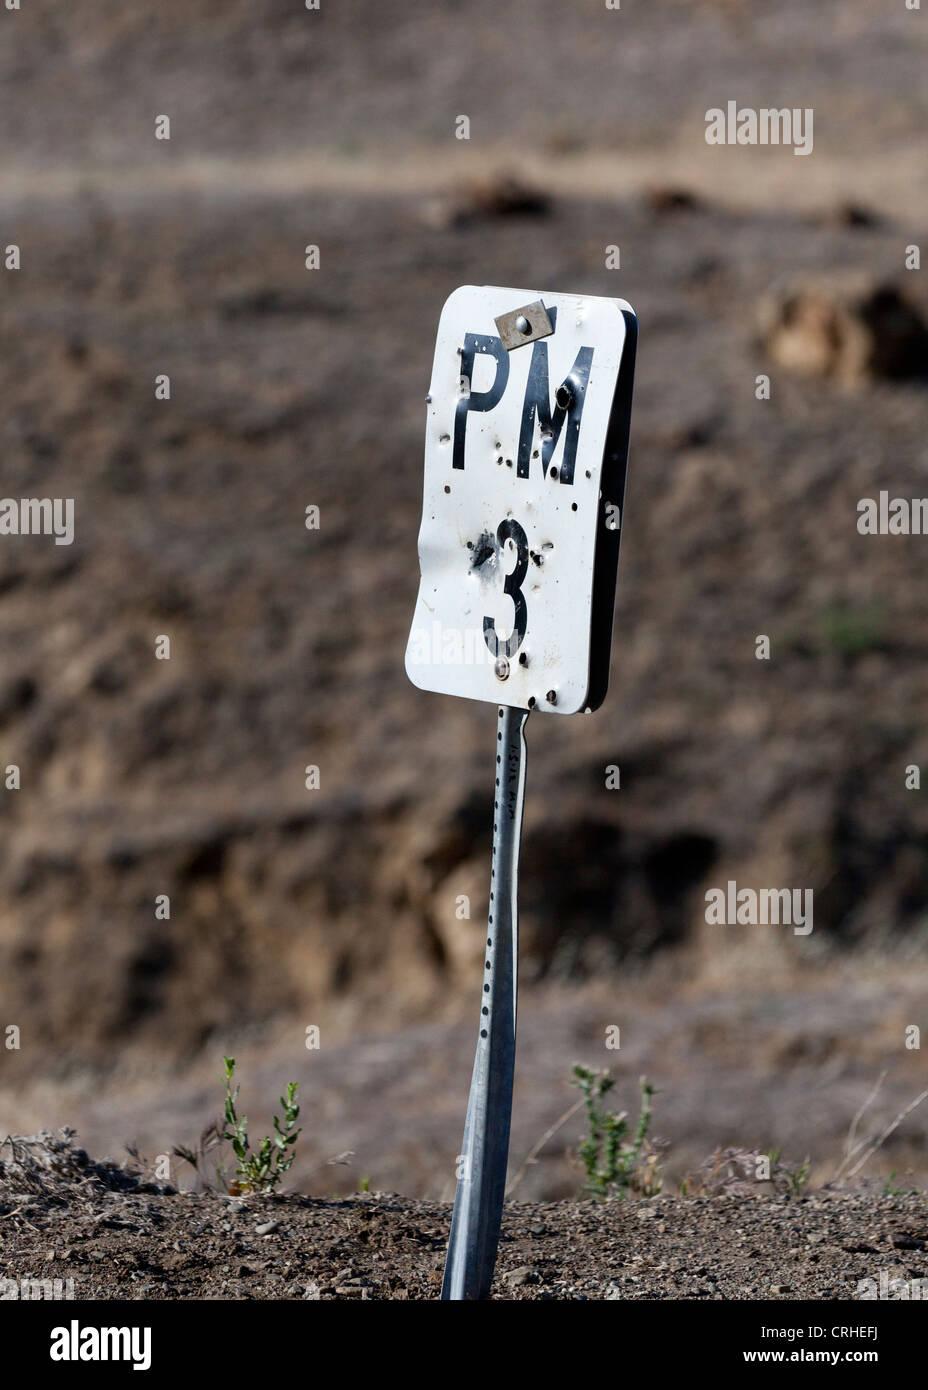 Bullet ridden road sign Stock Photo